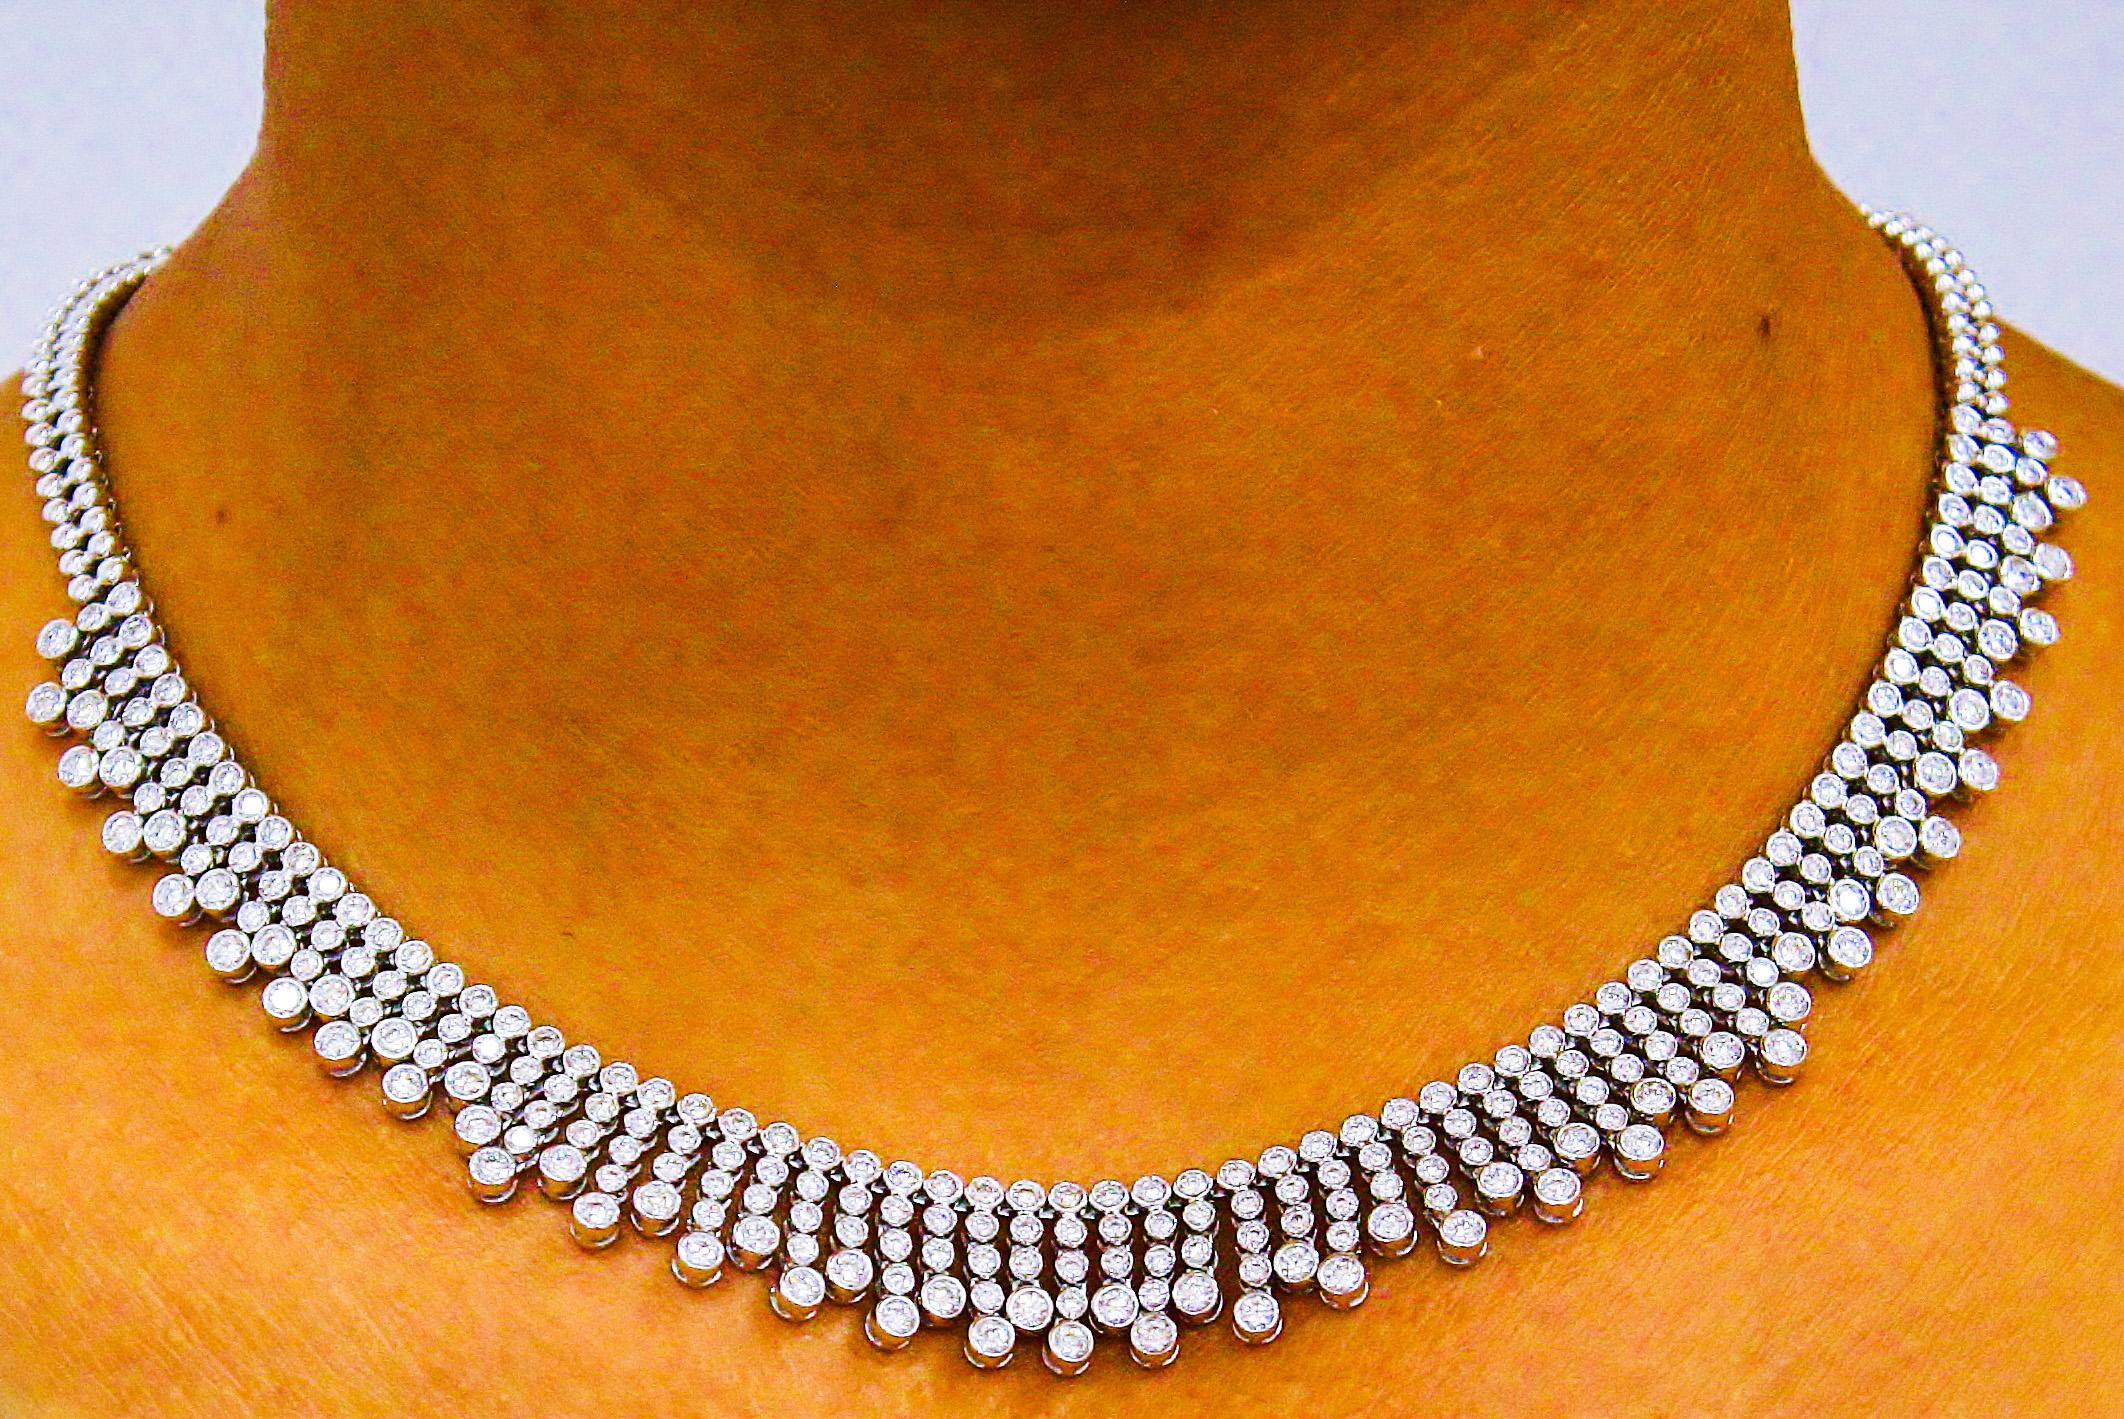 Sell_Your_Piero_Milano_Jewelry